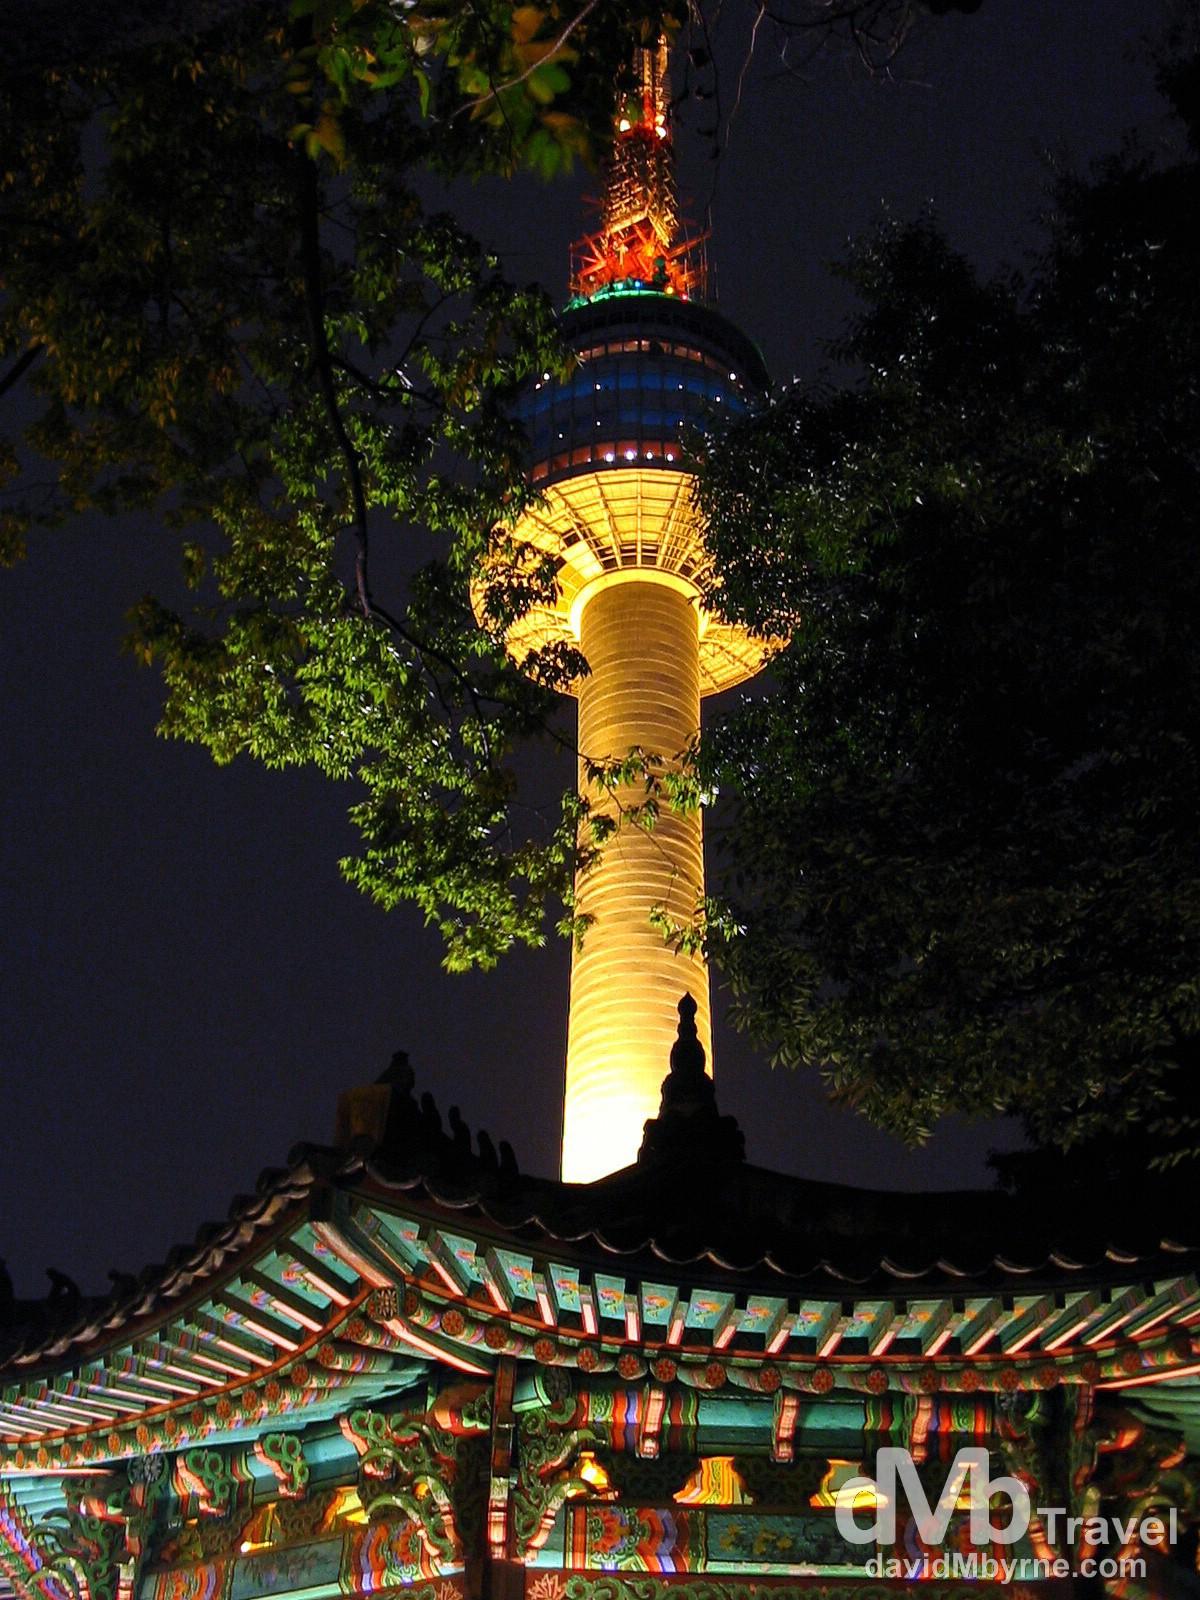 Seoul Tower from Namsan Park on Mount Namsan, Seoul, South Korea. August 14th 2004.